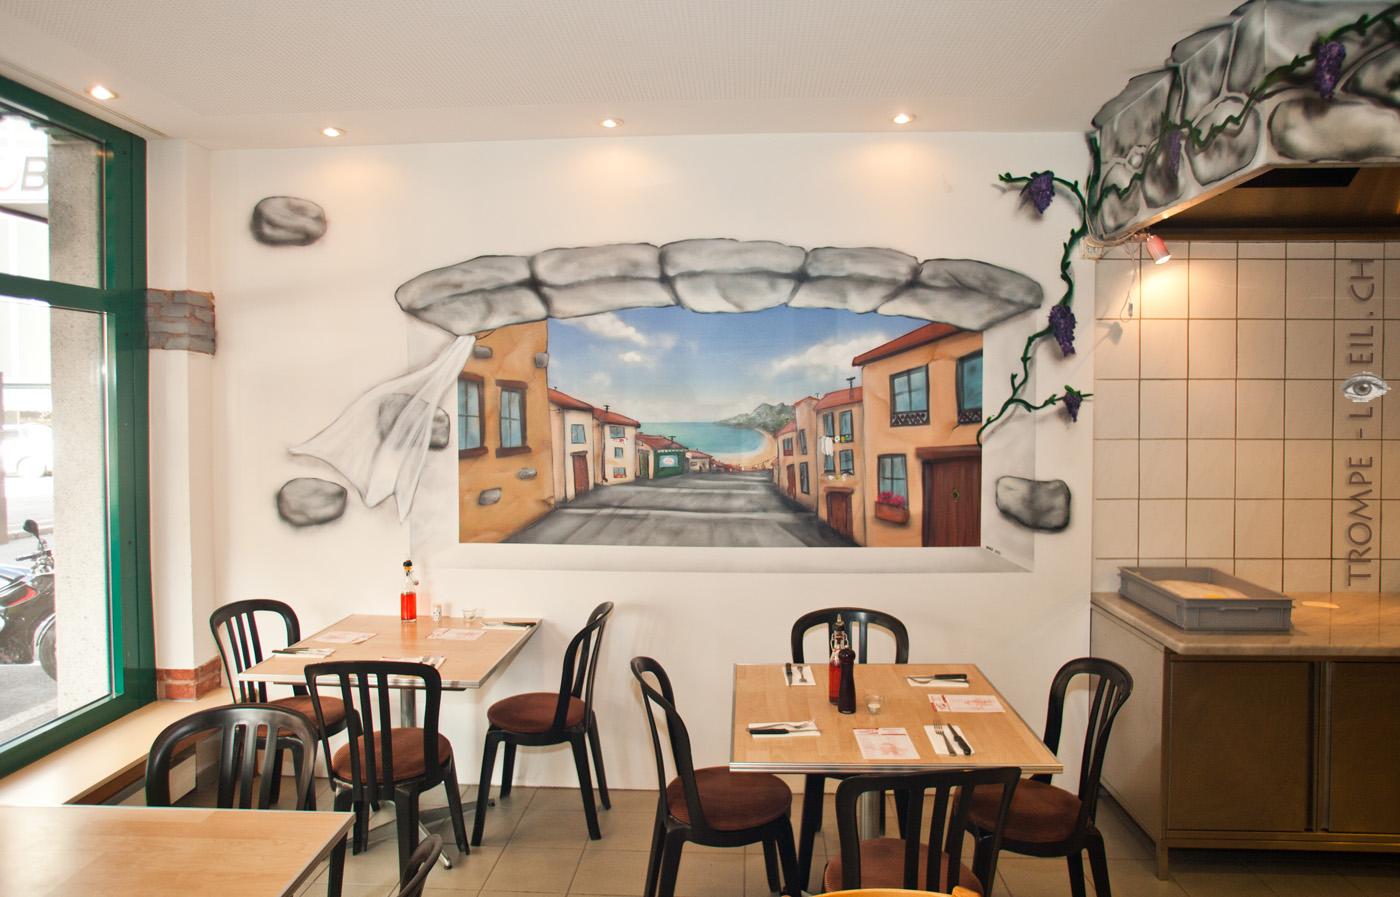 Deco Pizzeria. Interesting Deco Pizzeria Mdia Mixtes Par Oscar ...